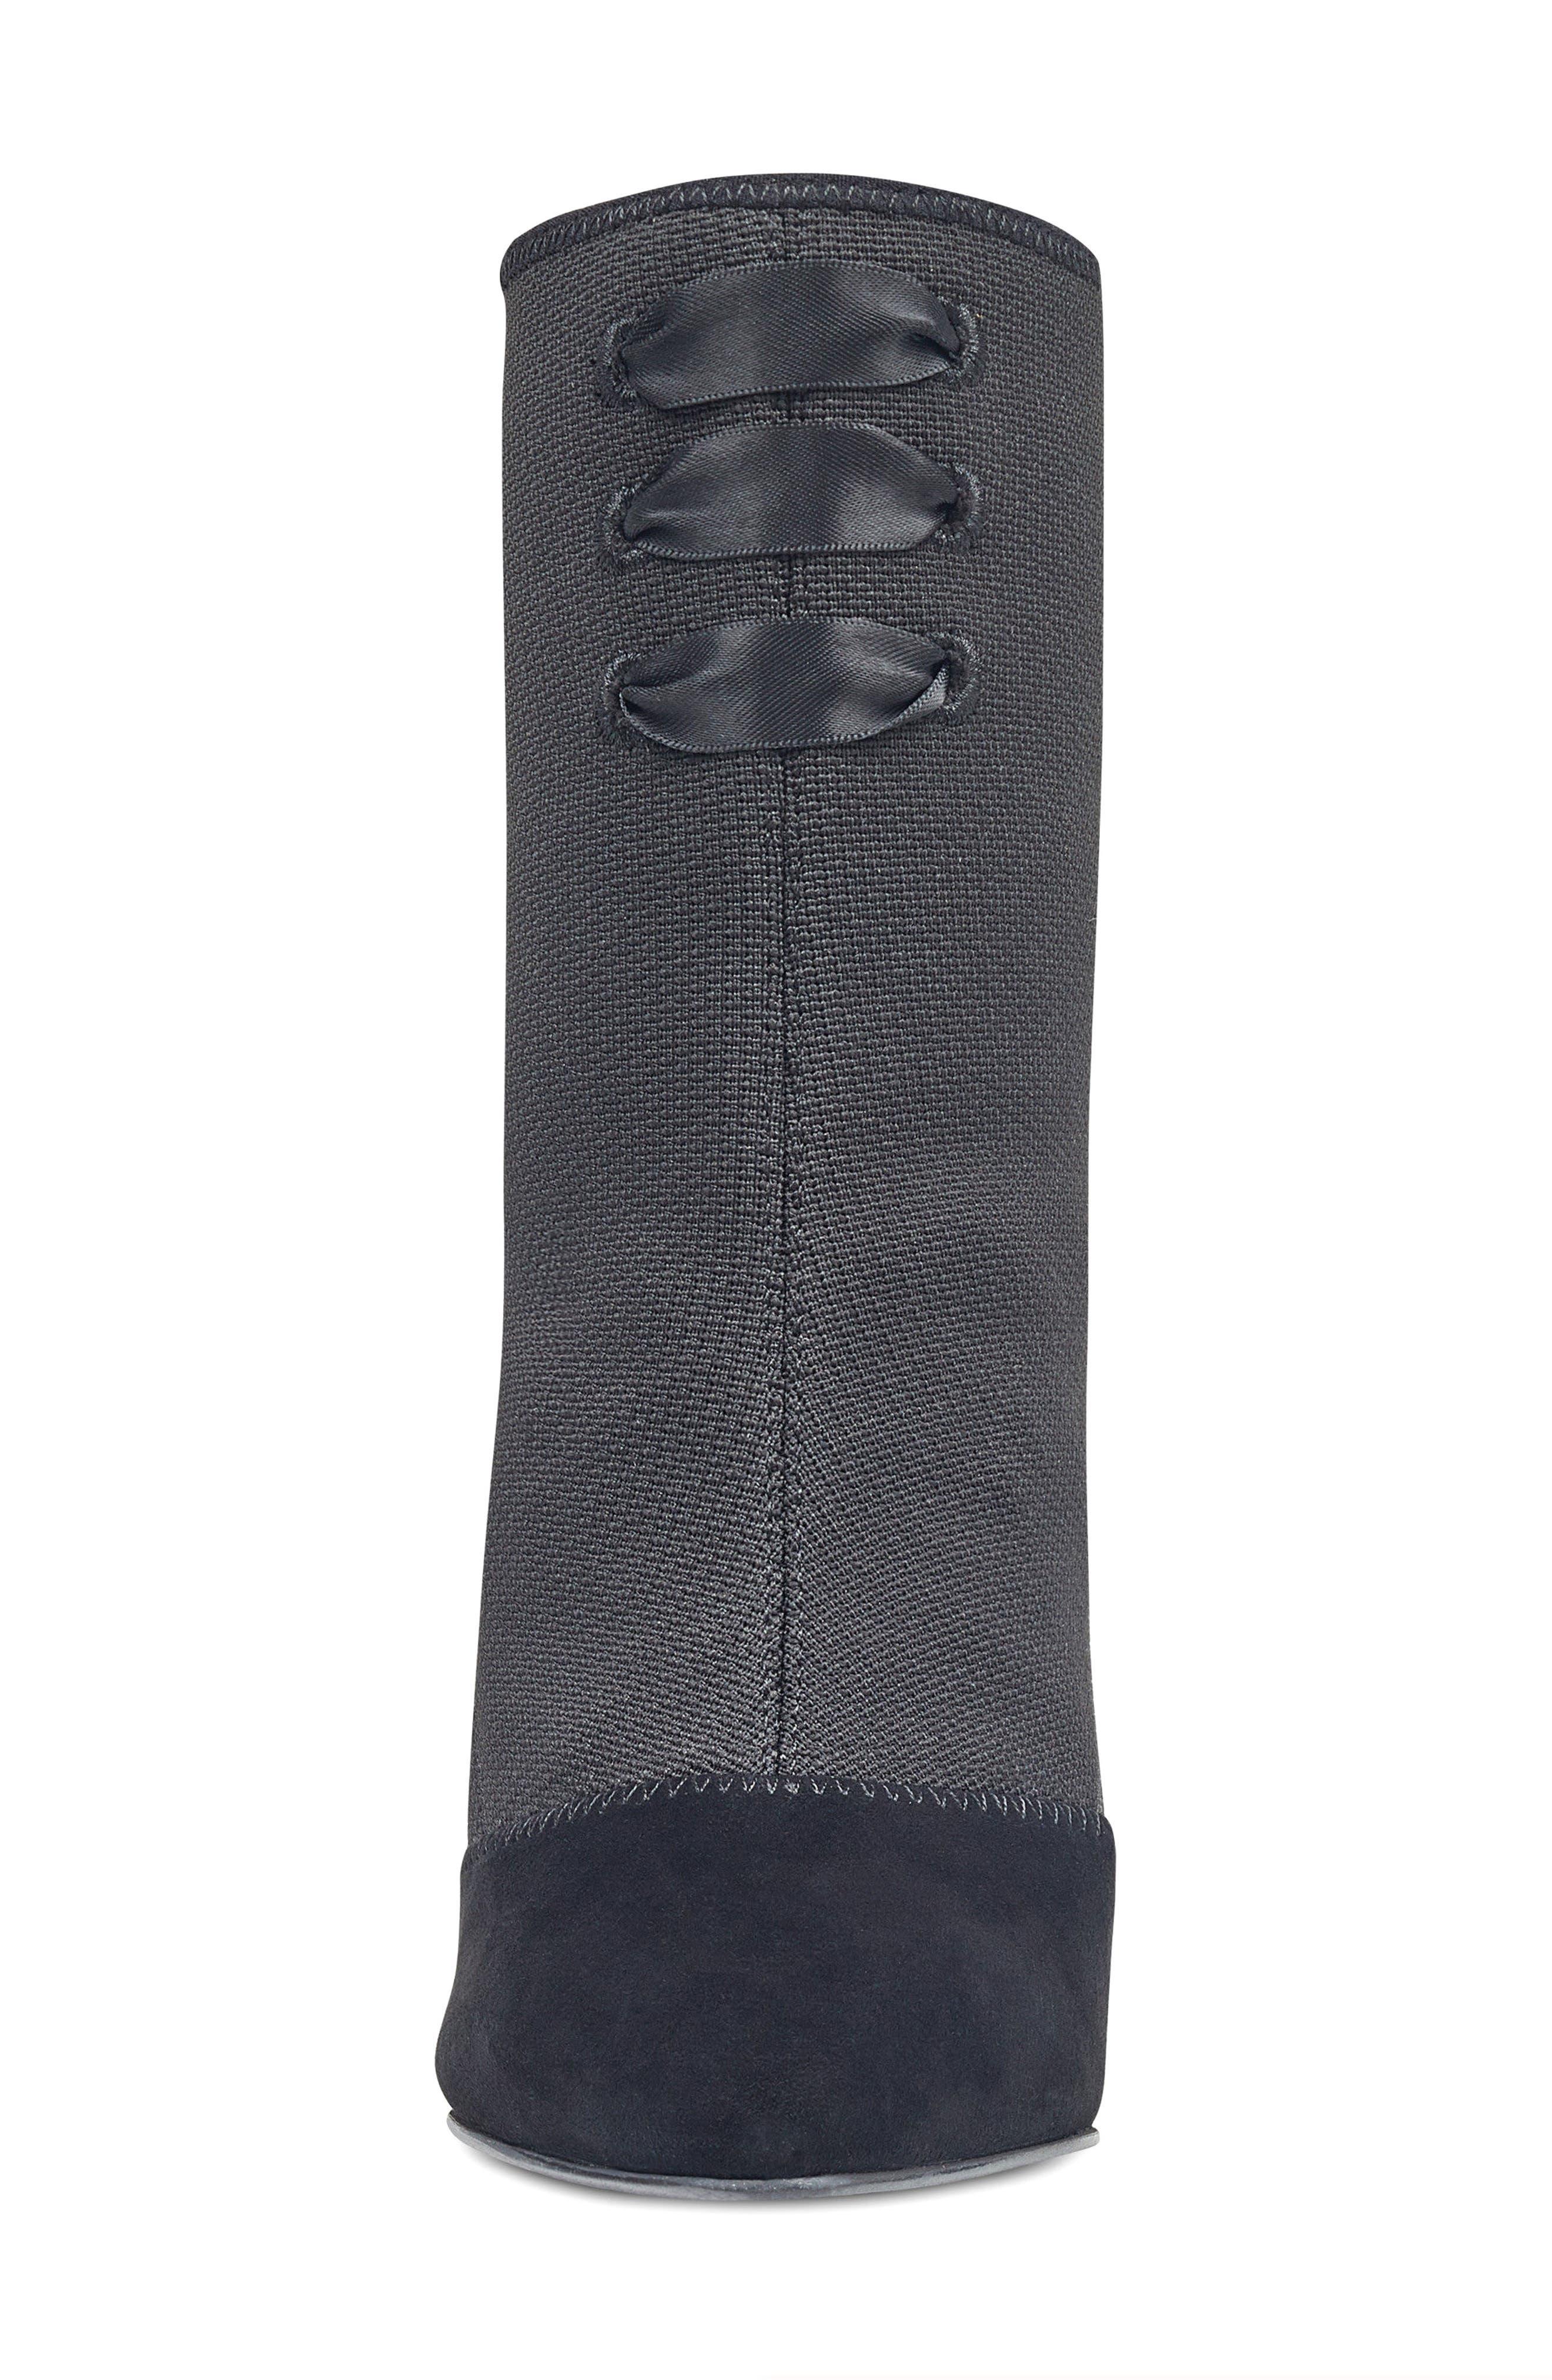 Carolina Pointy Toe Bootie,                             Alternate thumbnail 4, color,                             Black Multi Fabric